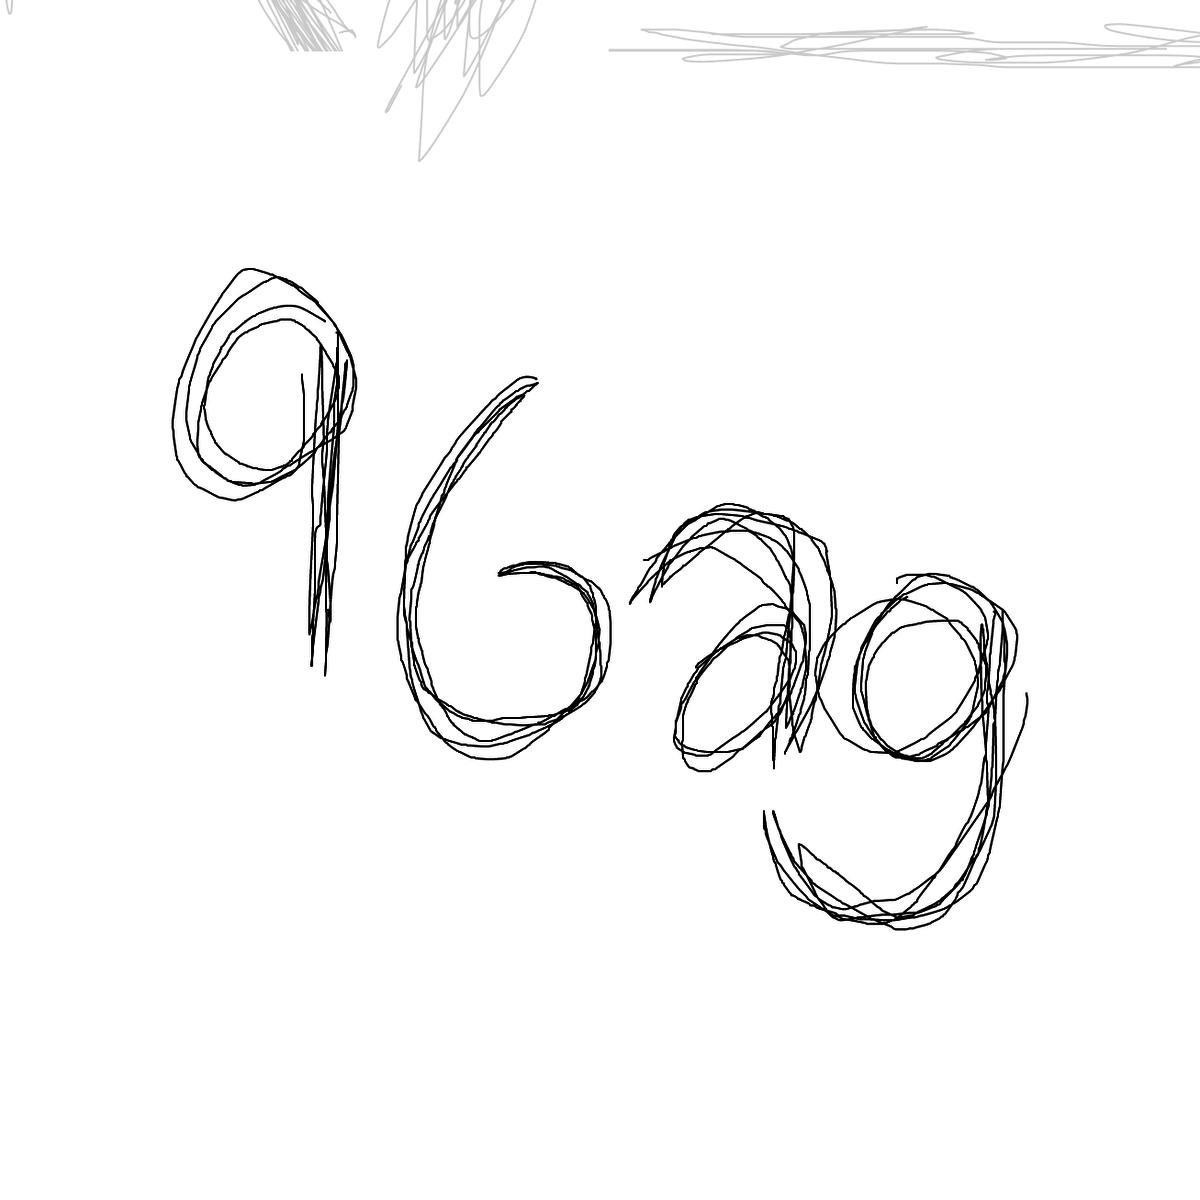 BAAAM drawing#8481 lat:-12.0500936508178710lng: -51.5040130615234400